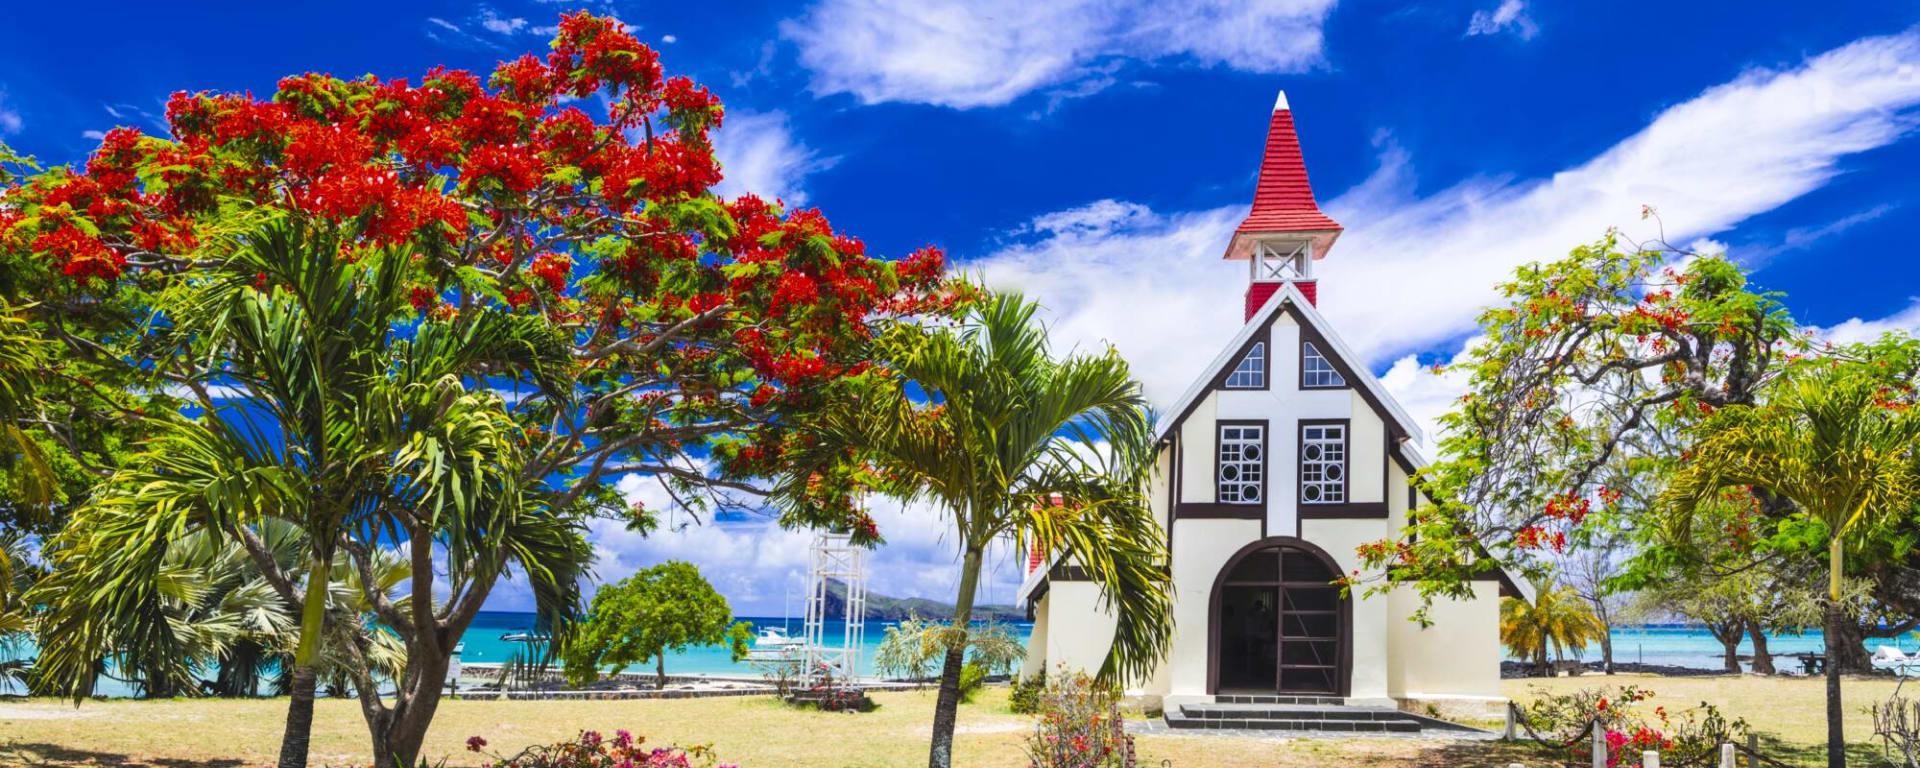 Mauritius entdecken mit Tischler Reisen: Mauritius Cap Malheureux Kirche